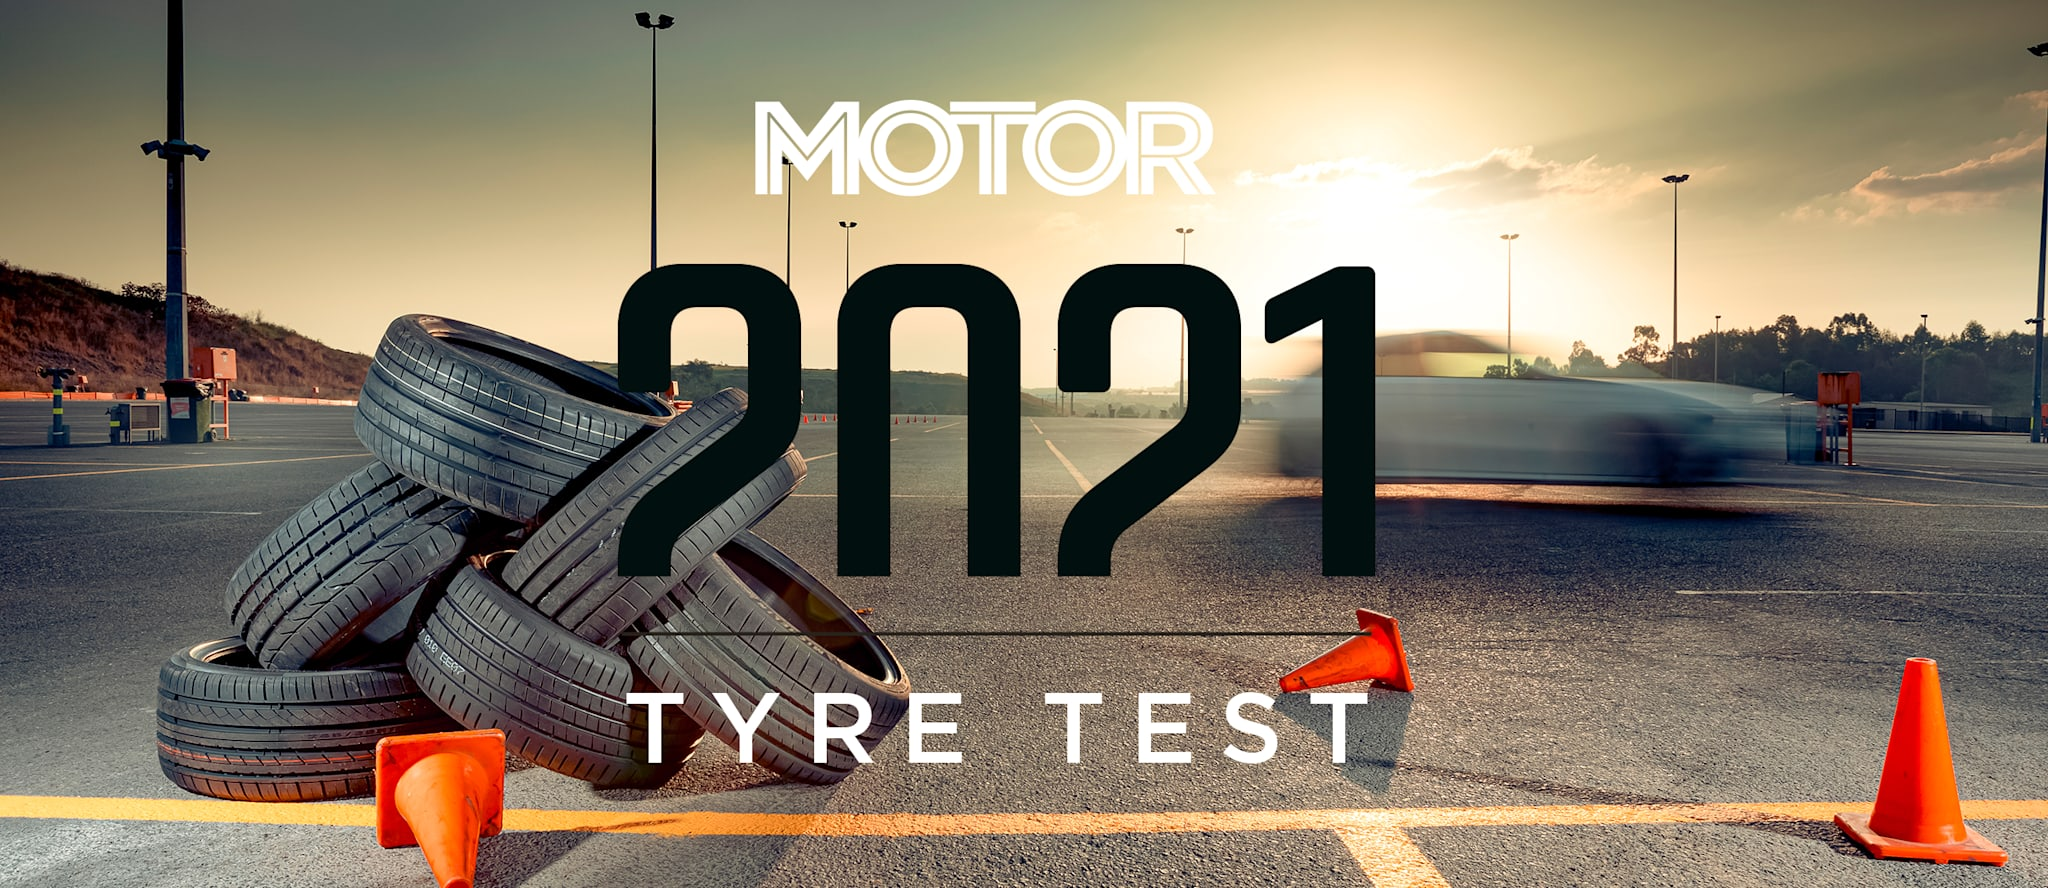 MOTOR 2021 年轮胎测试